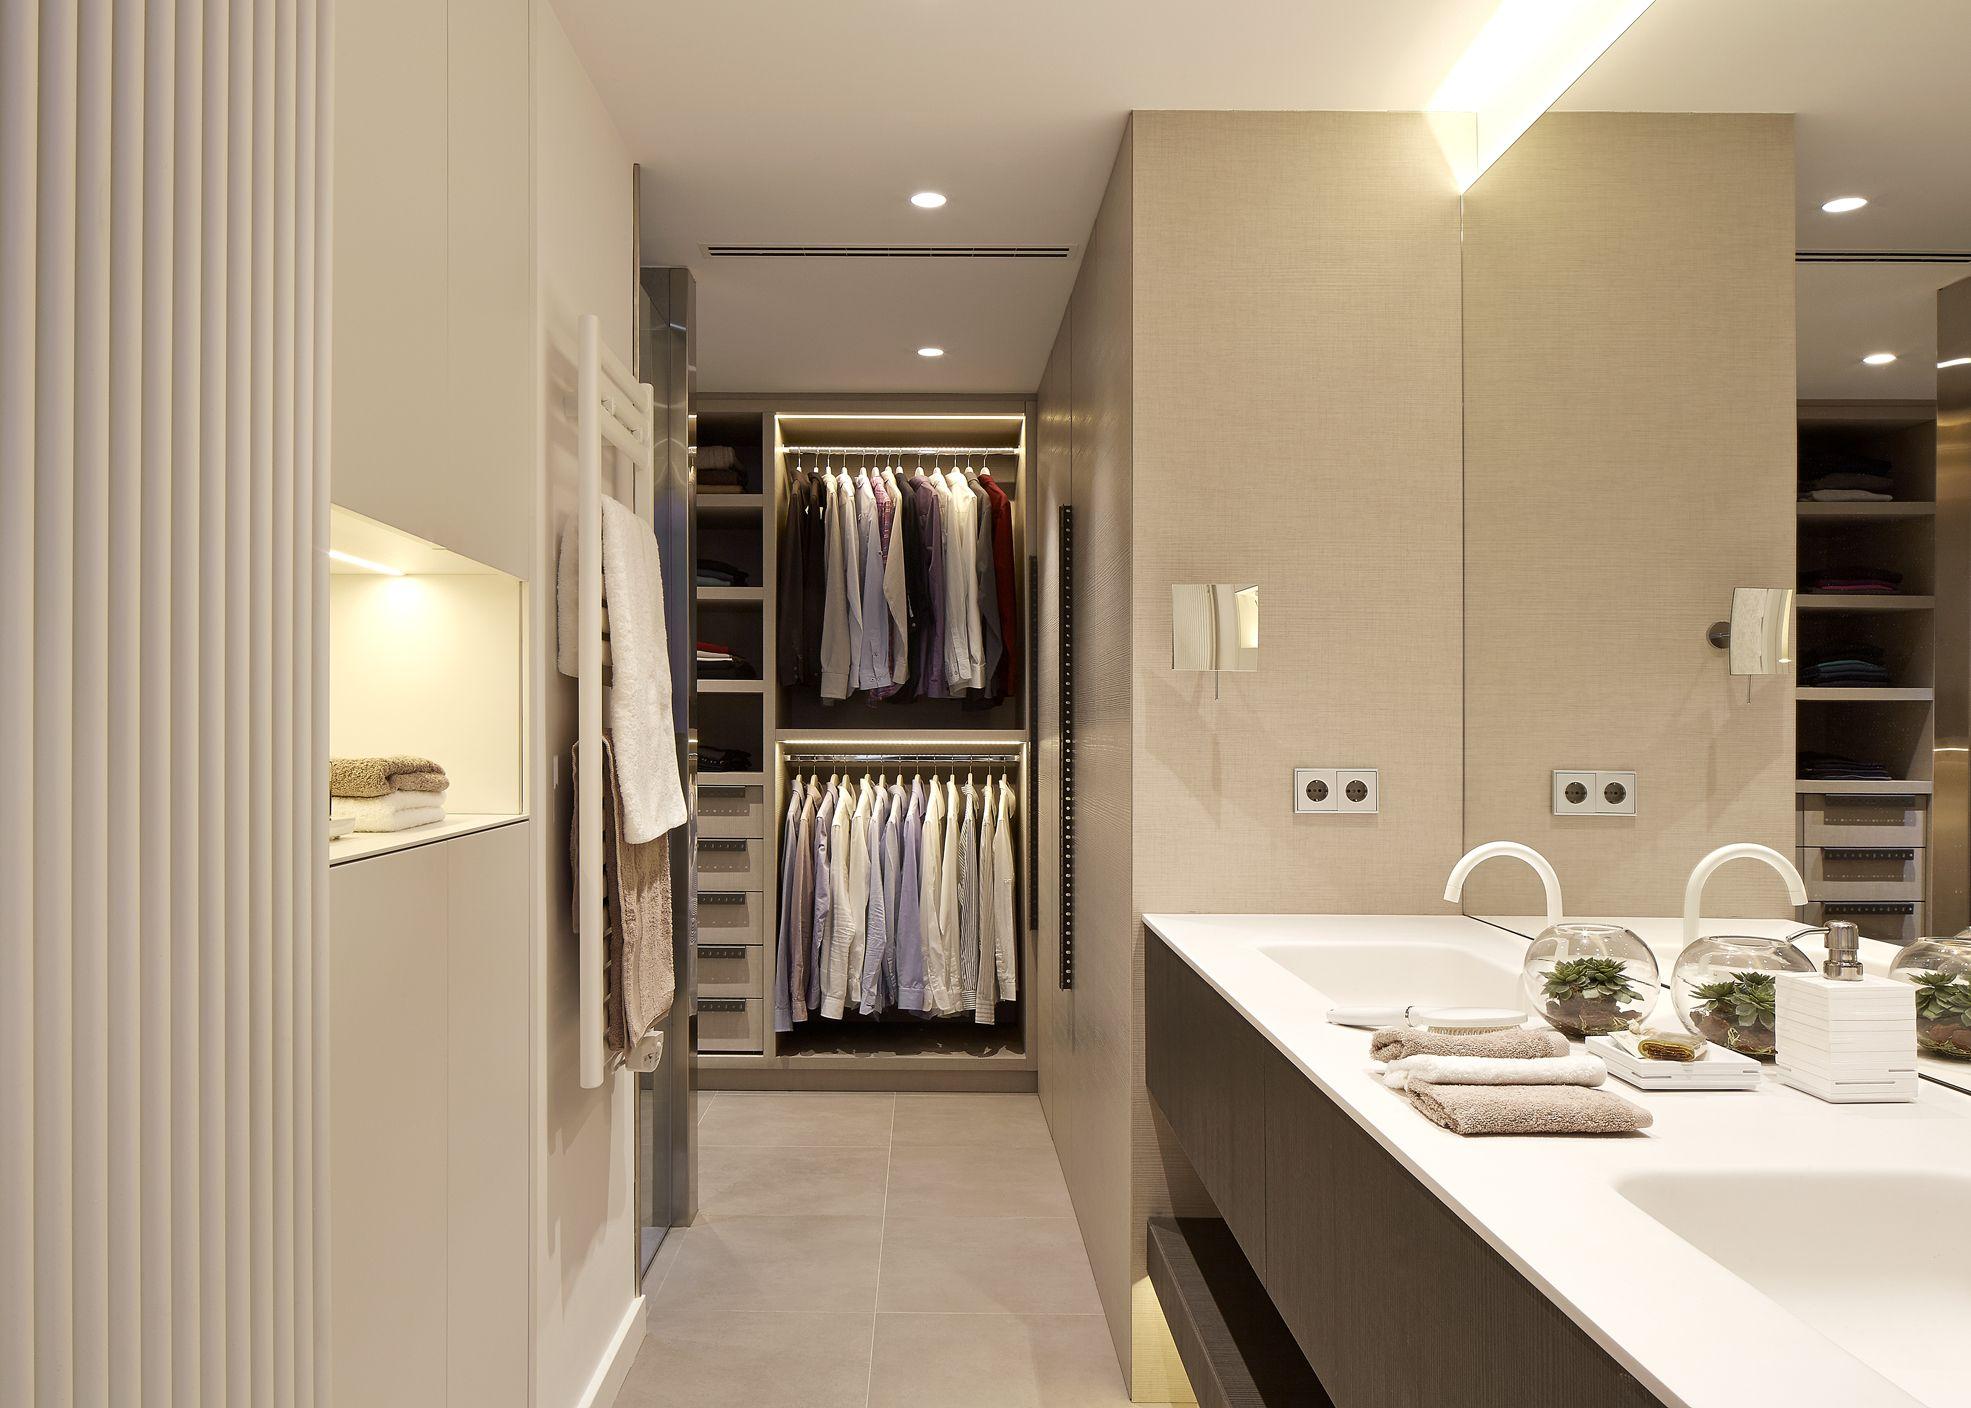 Molins interiors arquitectura interior interiorismo - Dormitorio principal ...